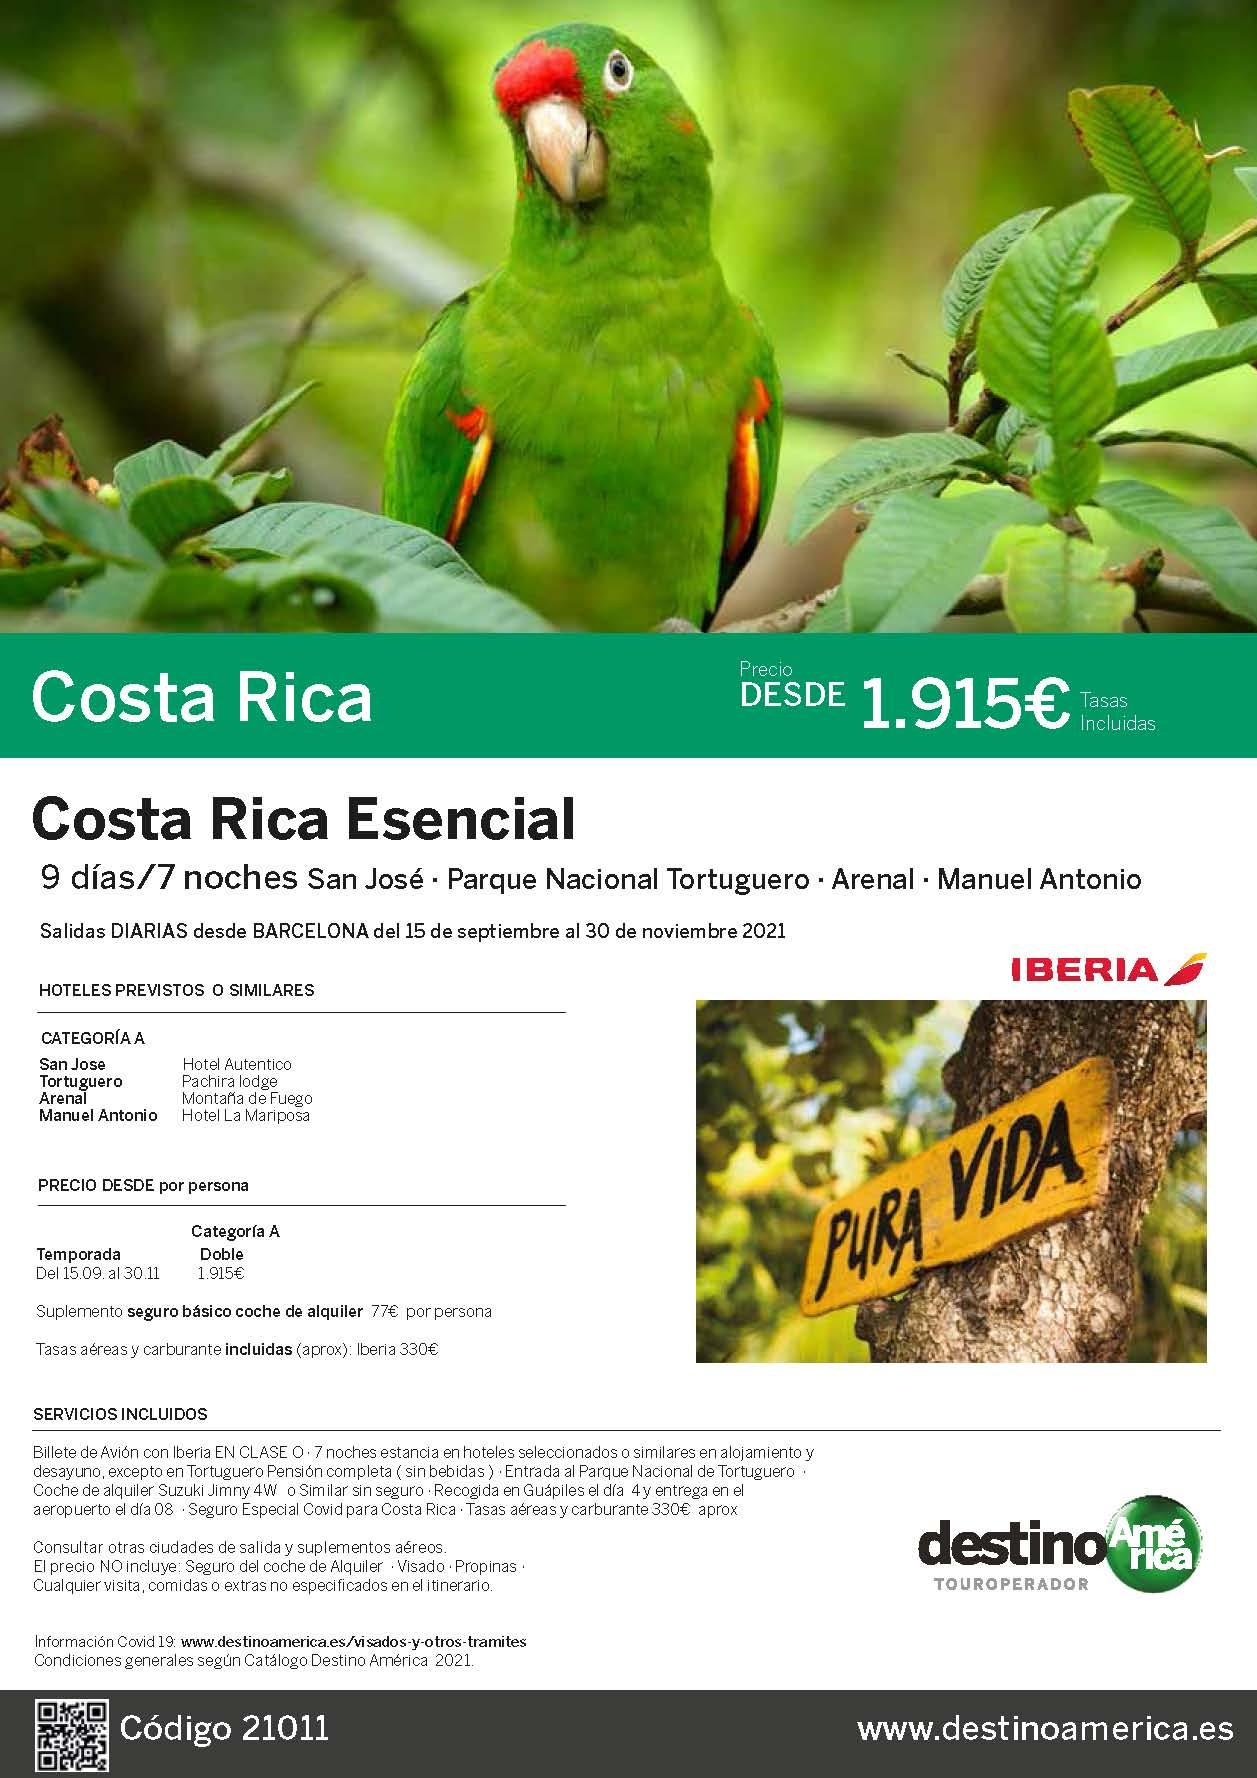 Oferta Destino America Costa Rica Esencial Octubre a Noviembre 2021 salida desde Barcelona